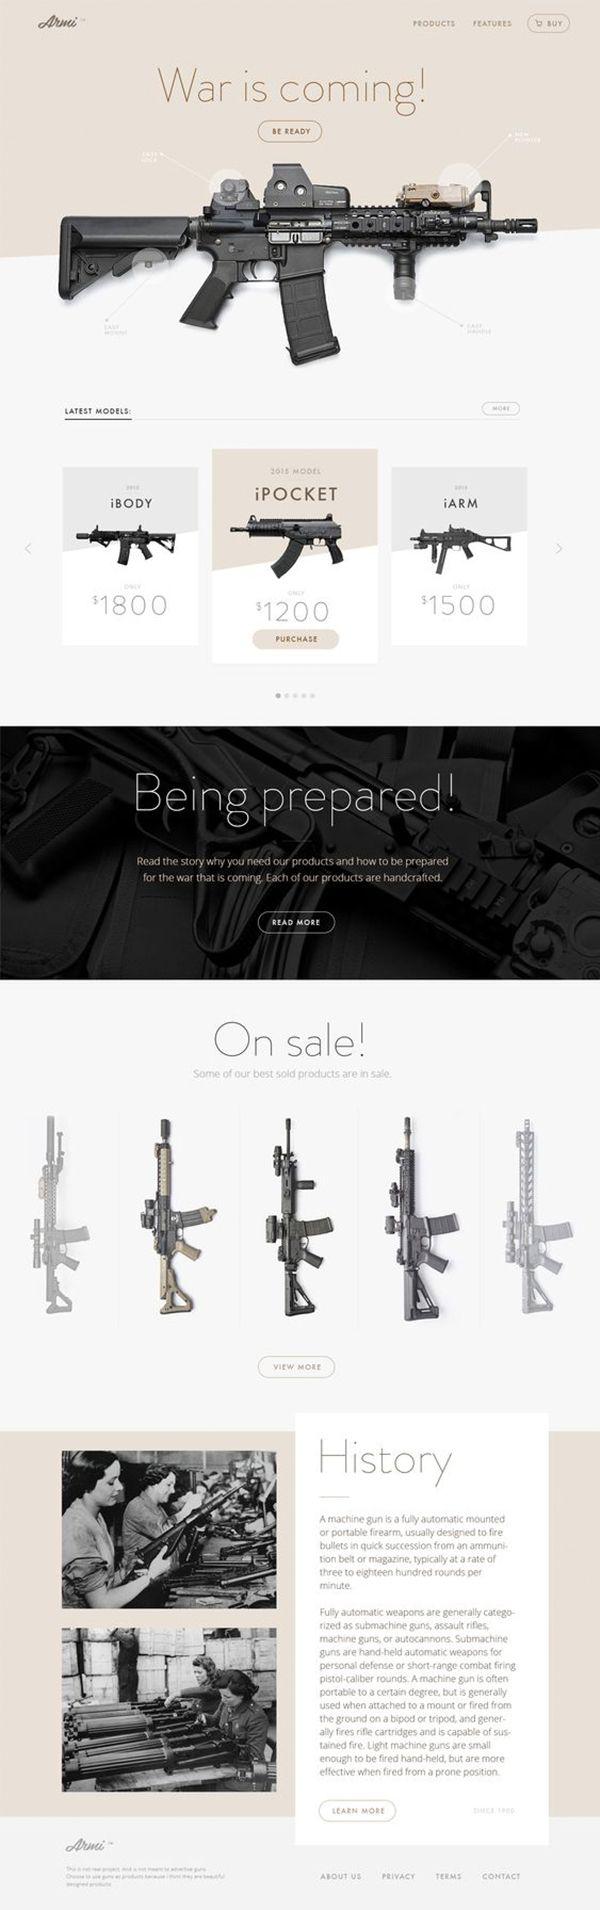 War Is Coming | Landing Page Design Inspiration